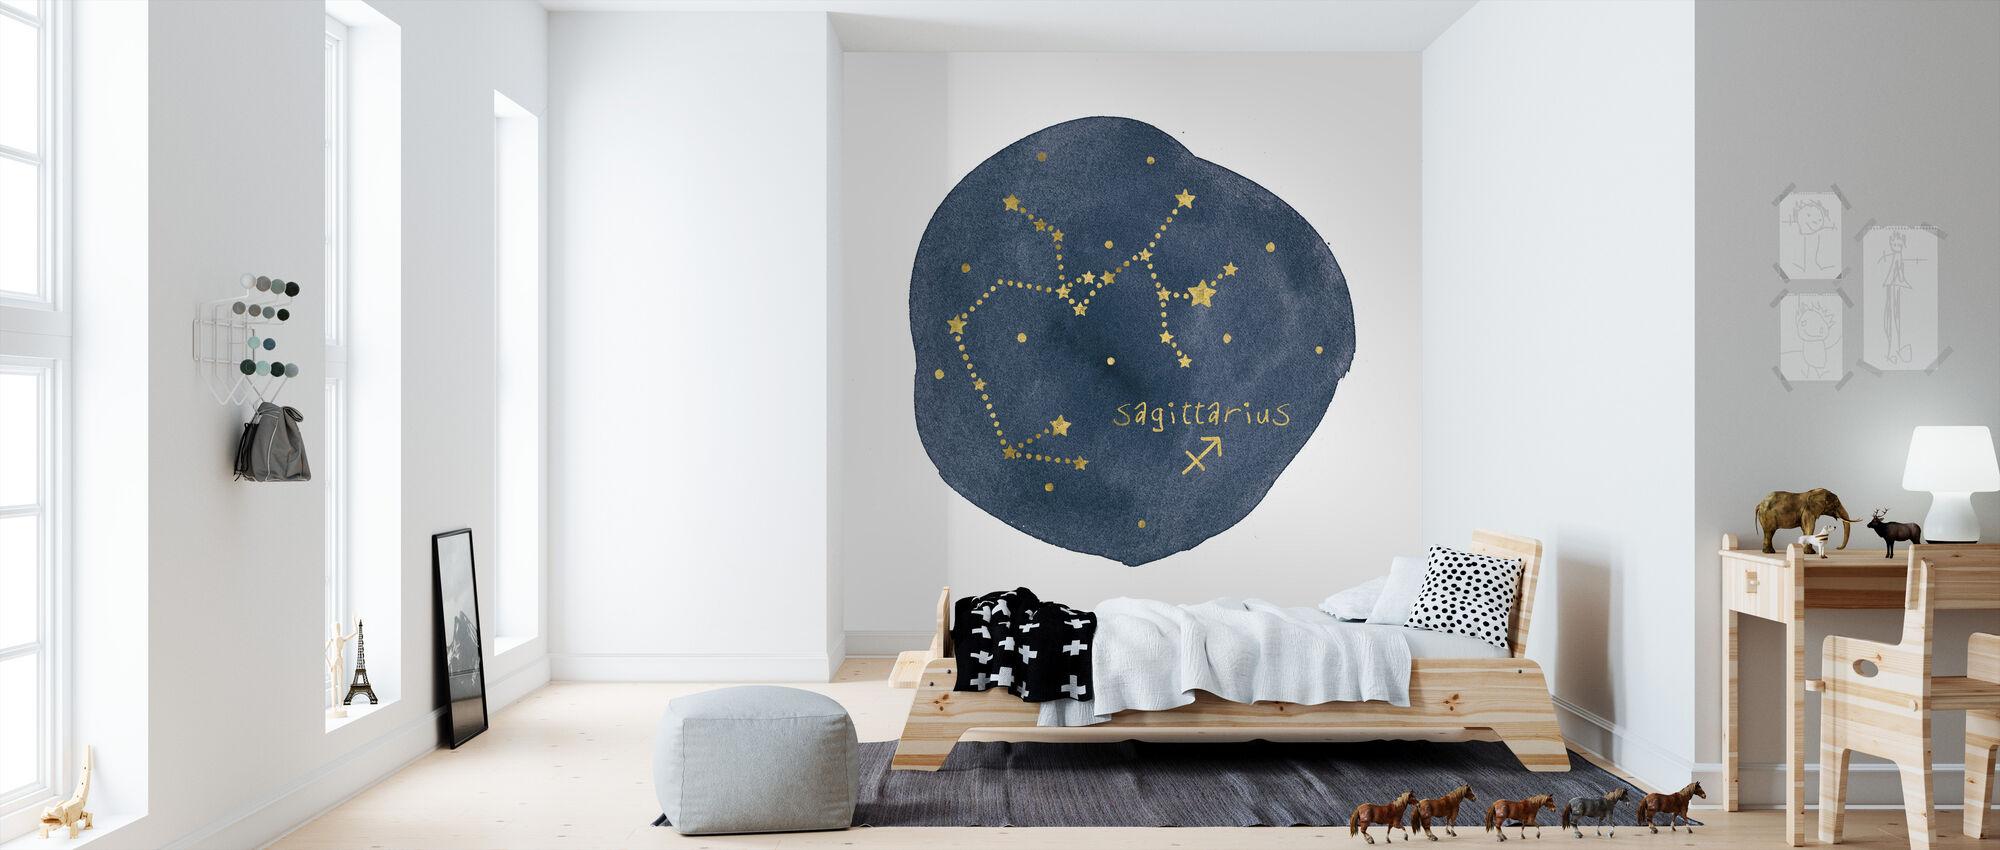 Horoscope Sagittarius - Wallpaper - Kids Room